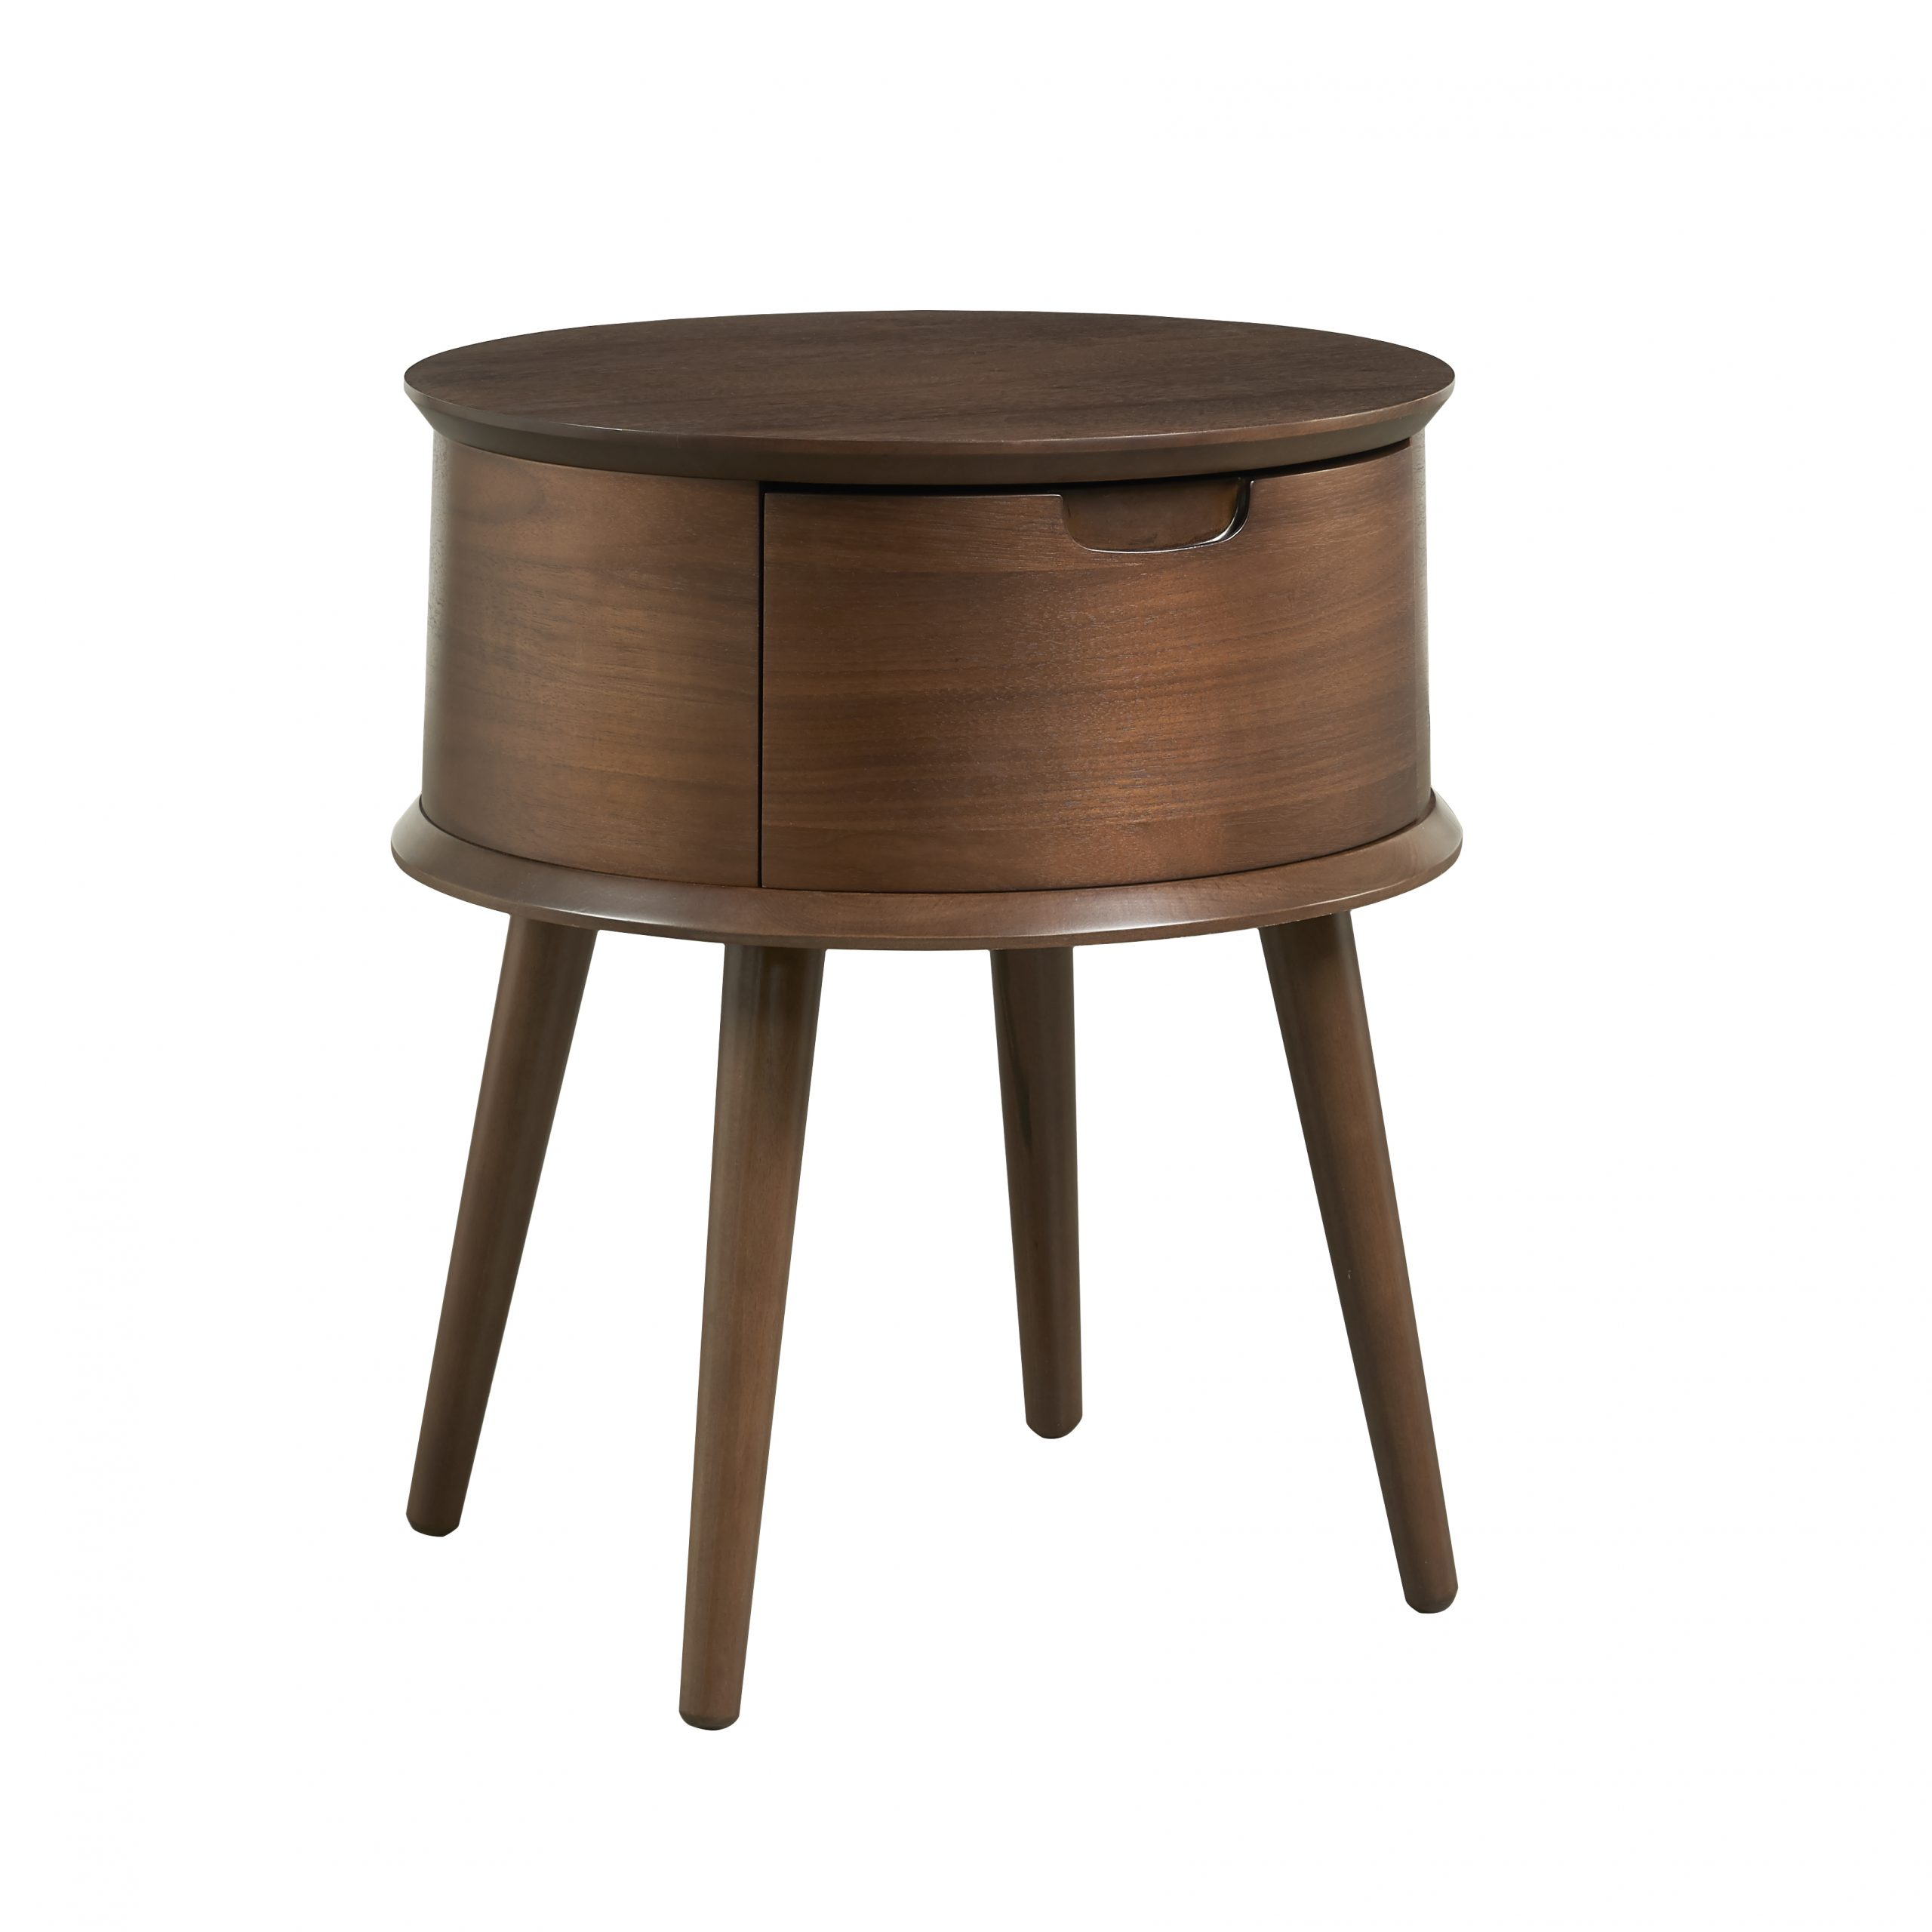 Tủ Đầu Giường Orbit Walnut - Gỗ Dẻ Gai